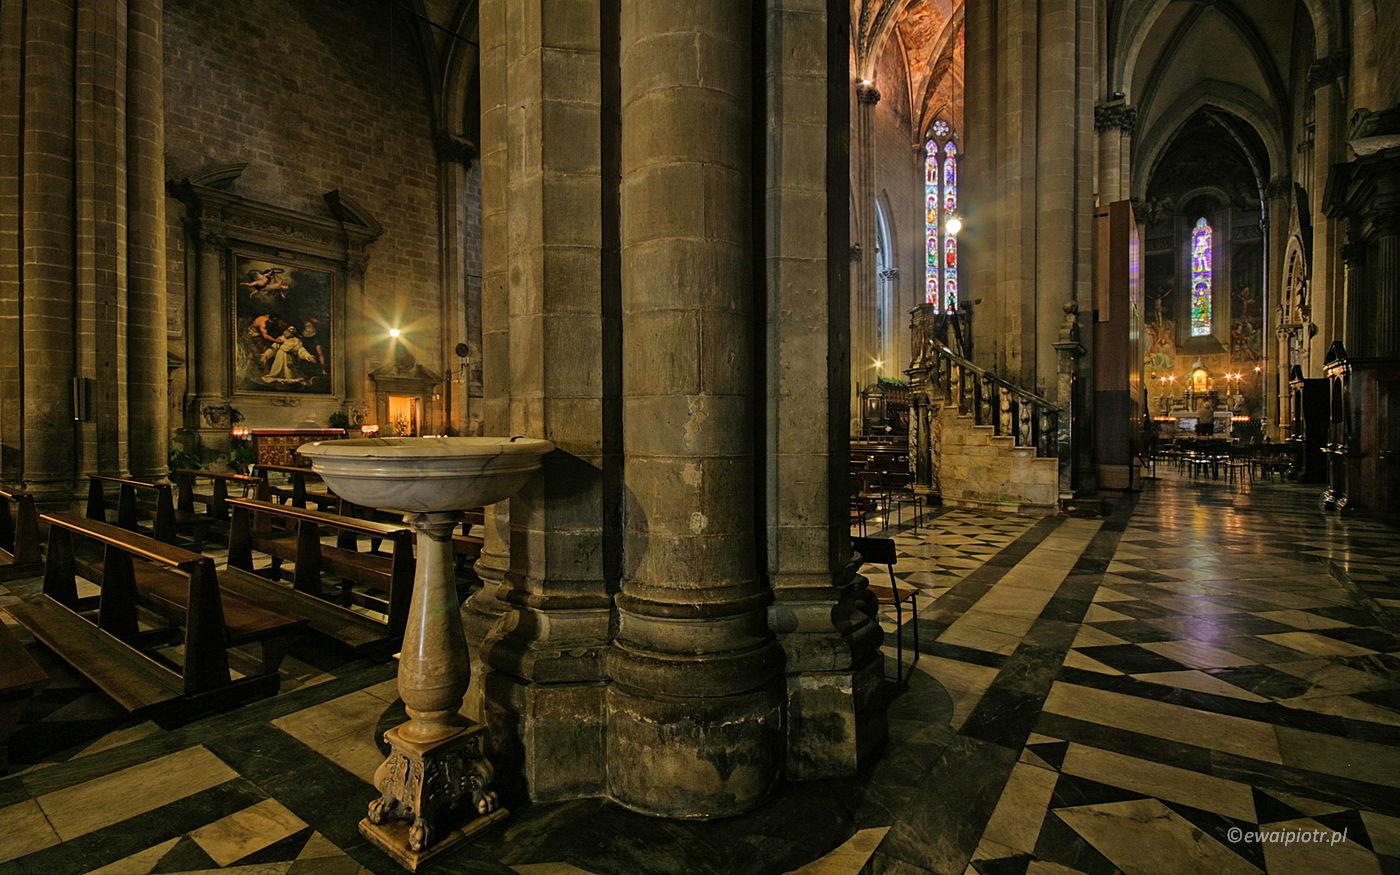 Karedra w Arrezzo, Toskania, technika HDR